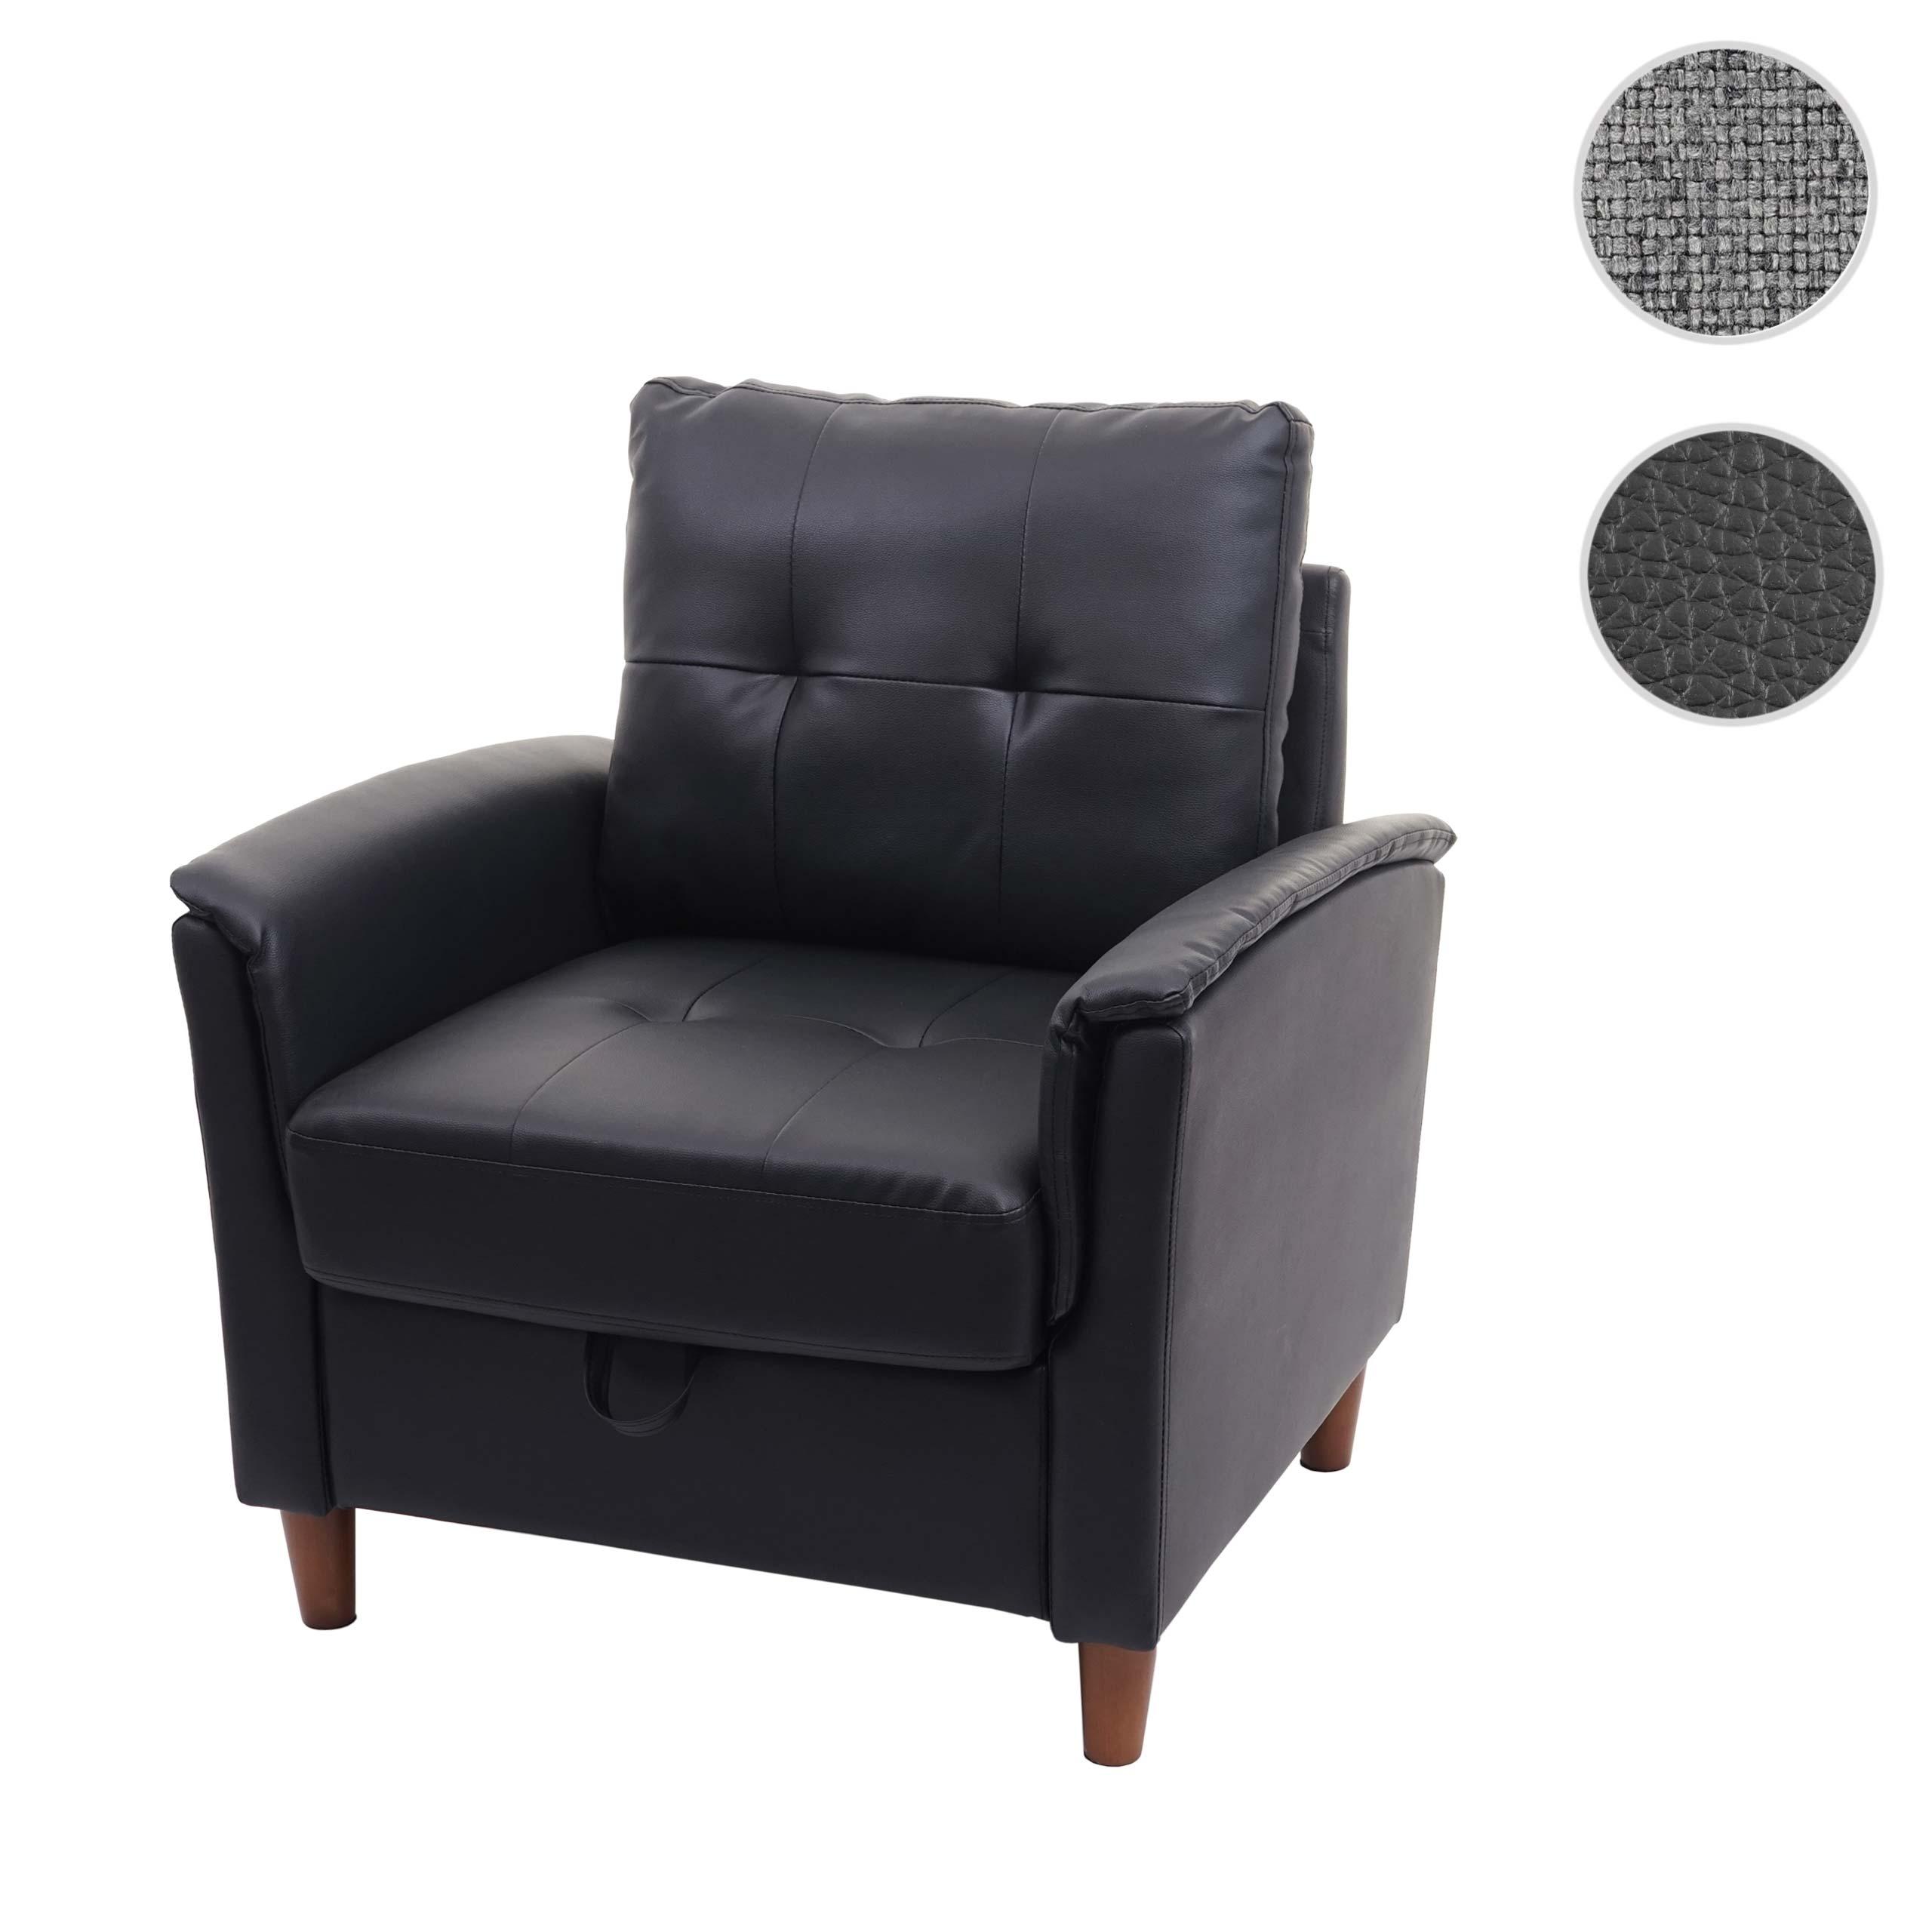 Mendler Sessel HWC-H23, Loungesessel Cocktailsessel Relaxsessel Fernsehsessel, Stecksystem Staufach ~ Varian 72691